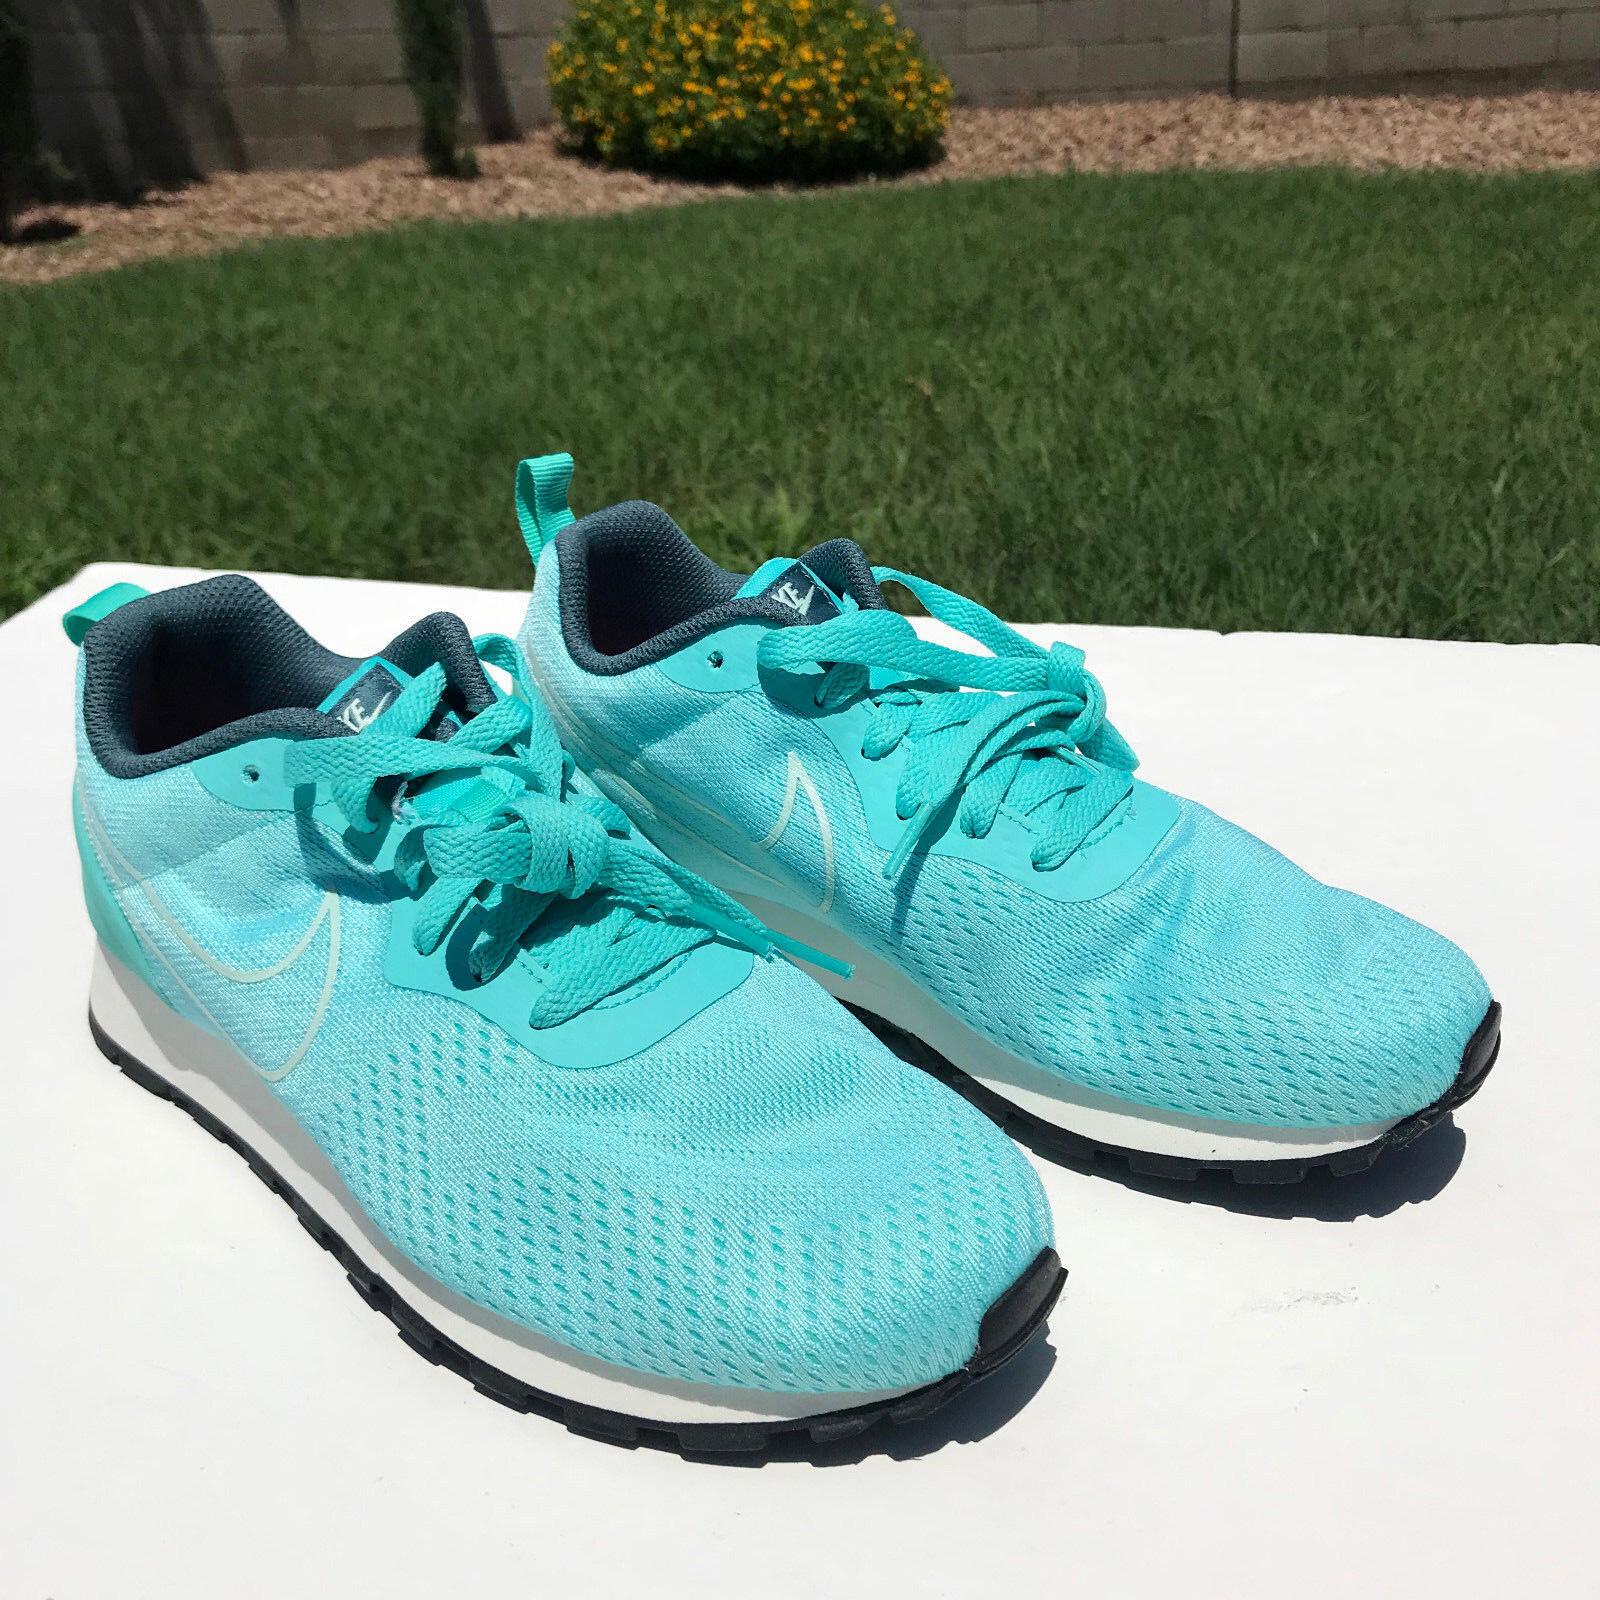 Nike Free MD Runner Eng Mesh Running Shoes Sz 7.5 Aurora Green 916797-300 NEW